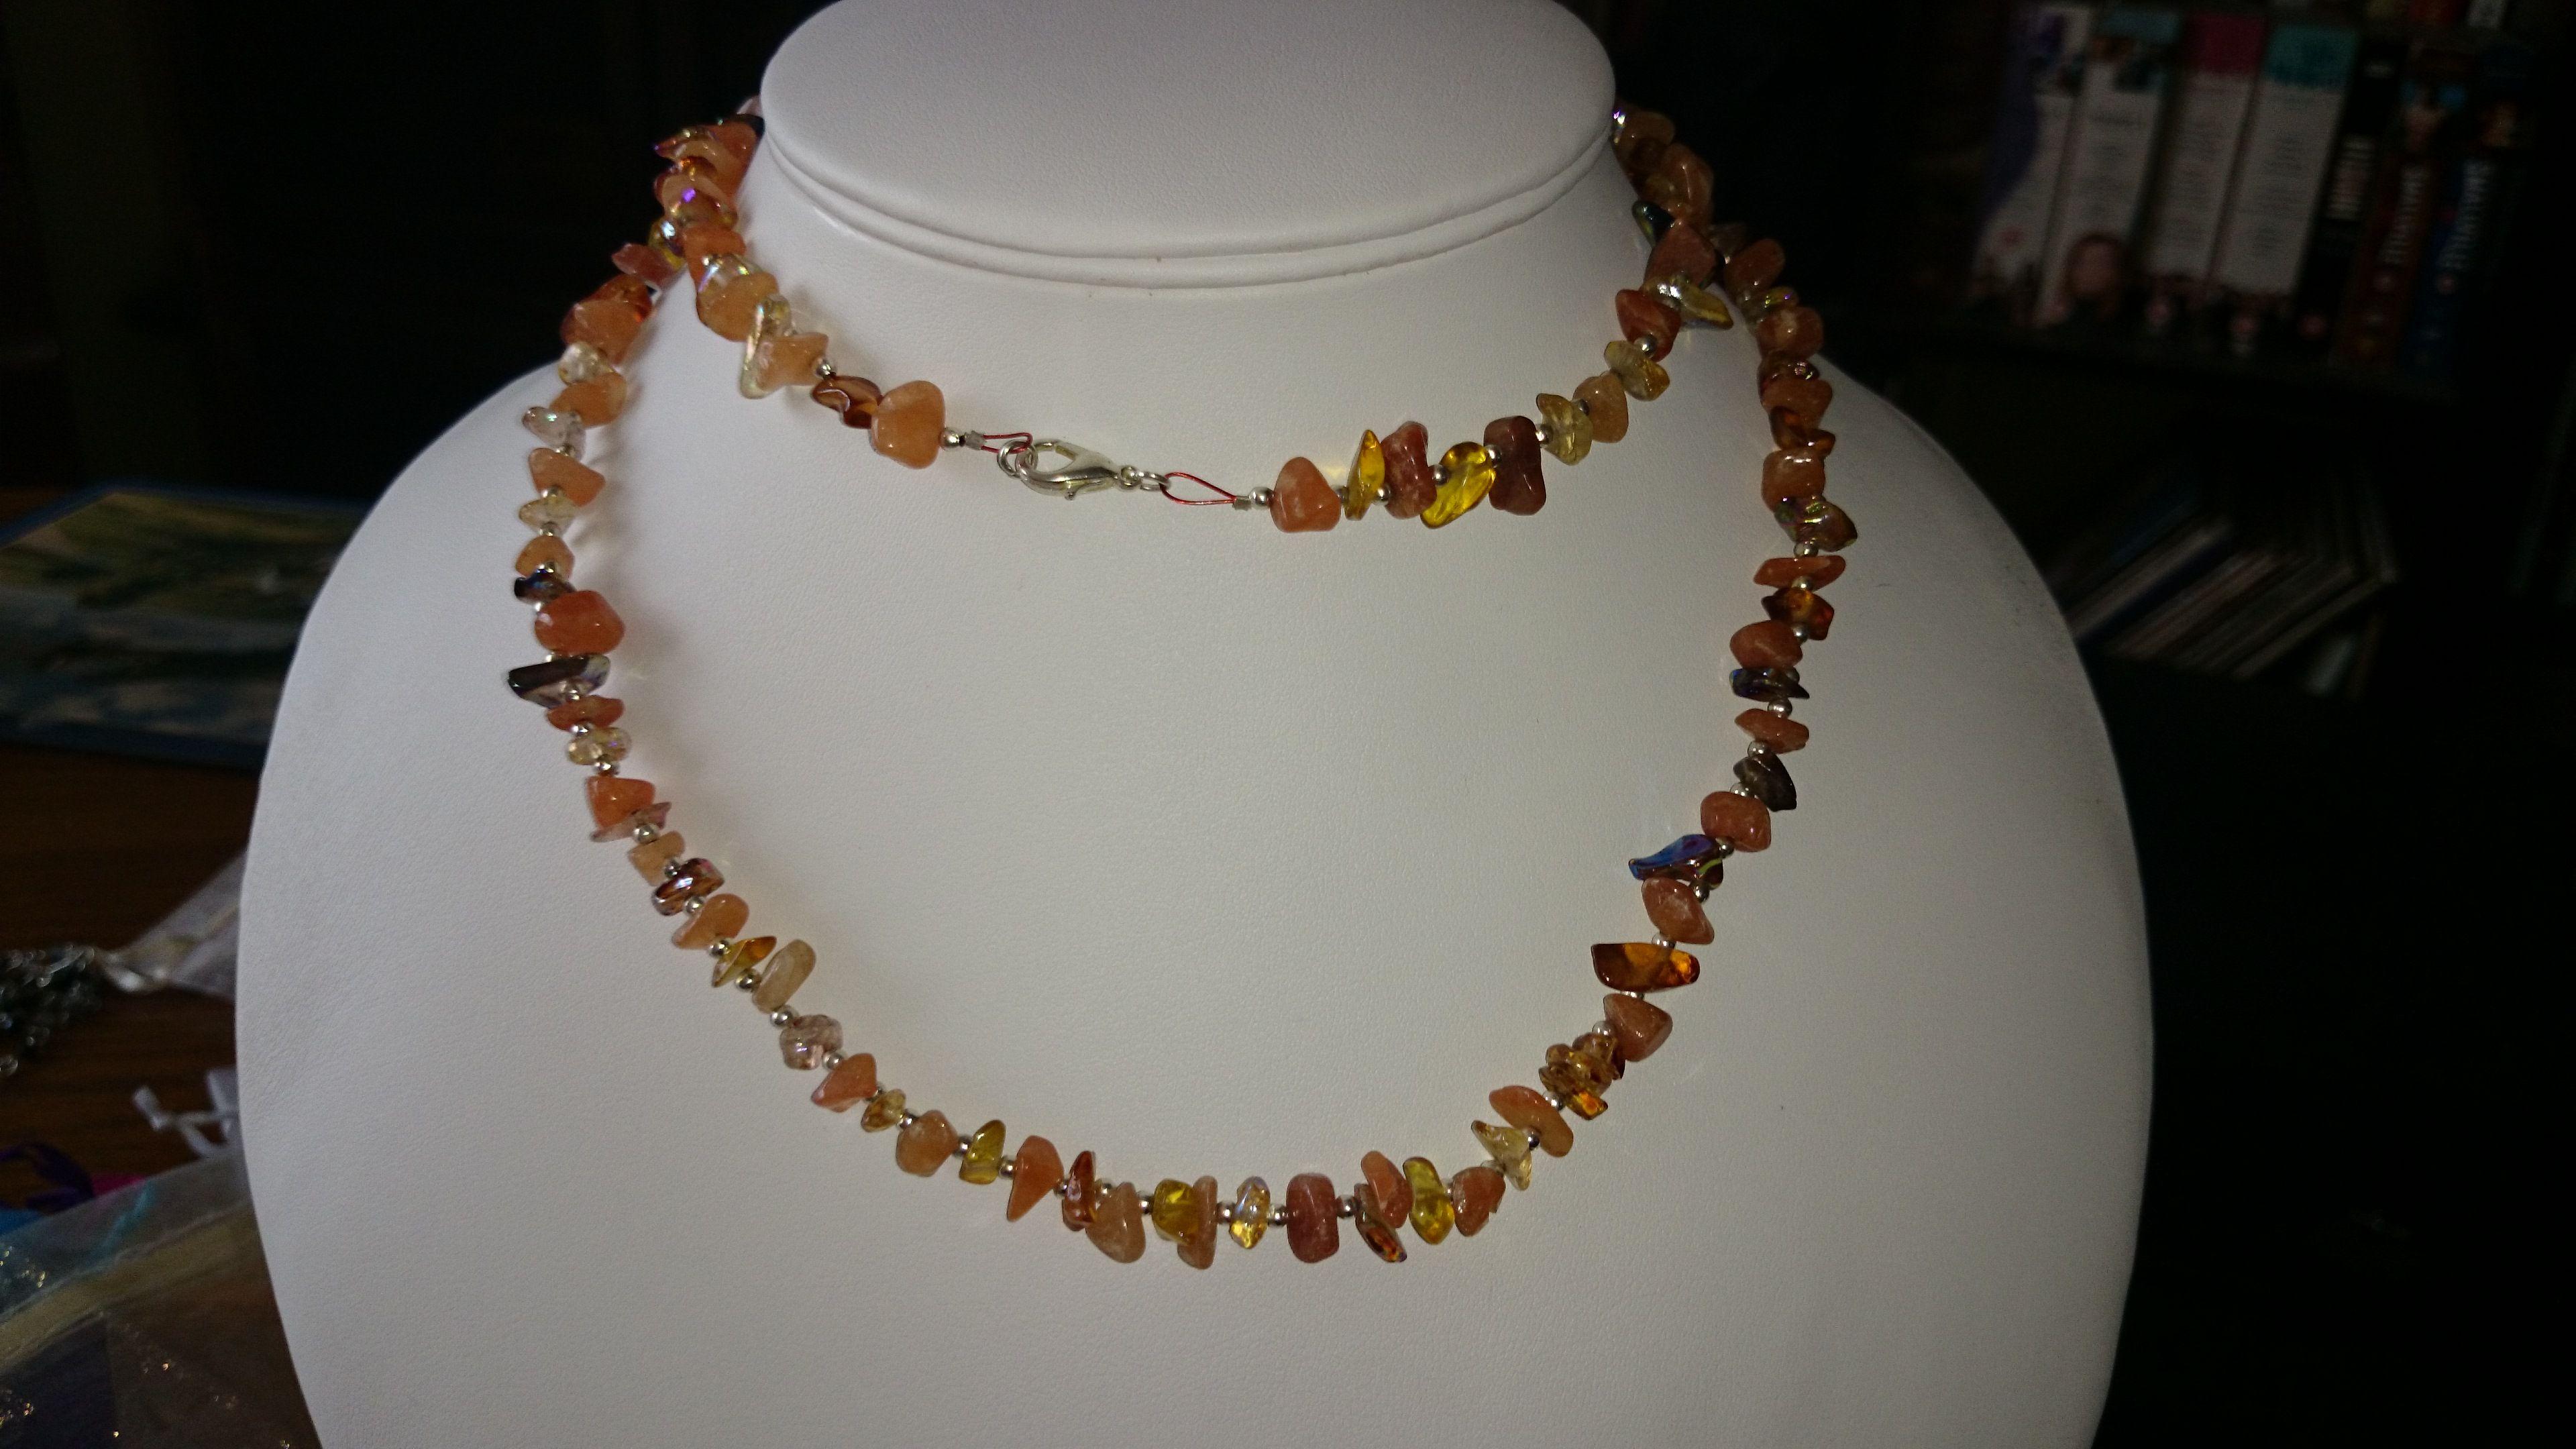 Agate chips necklace www.facebook.com/KimsGlitteringGems